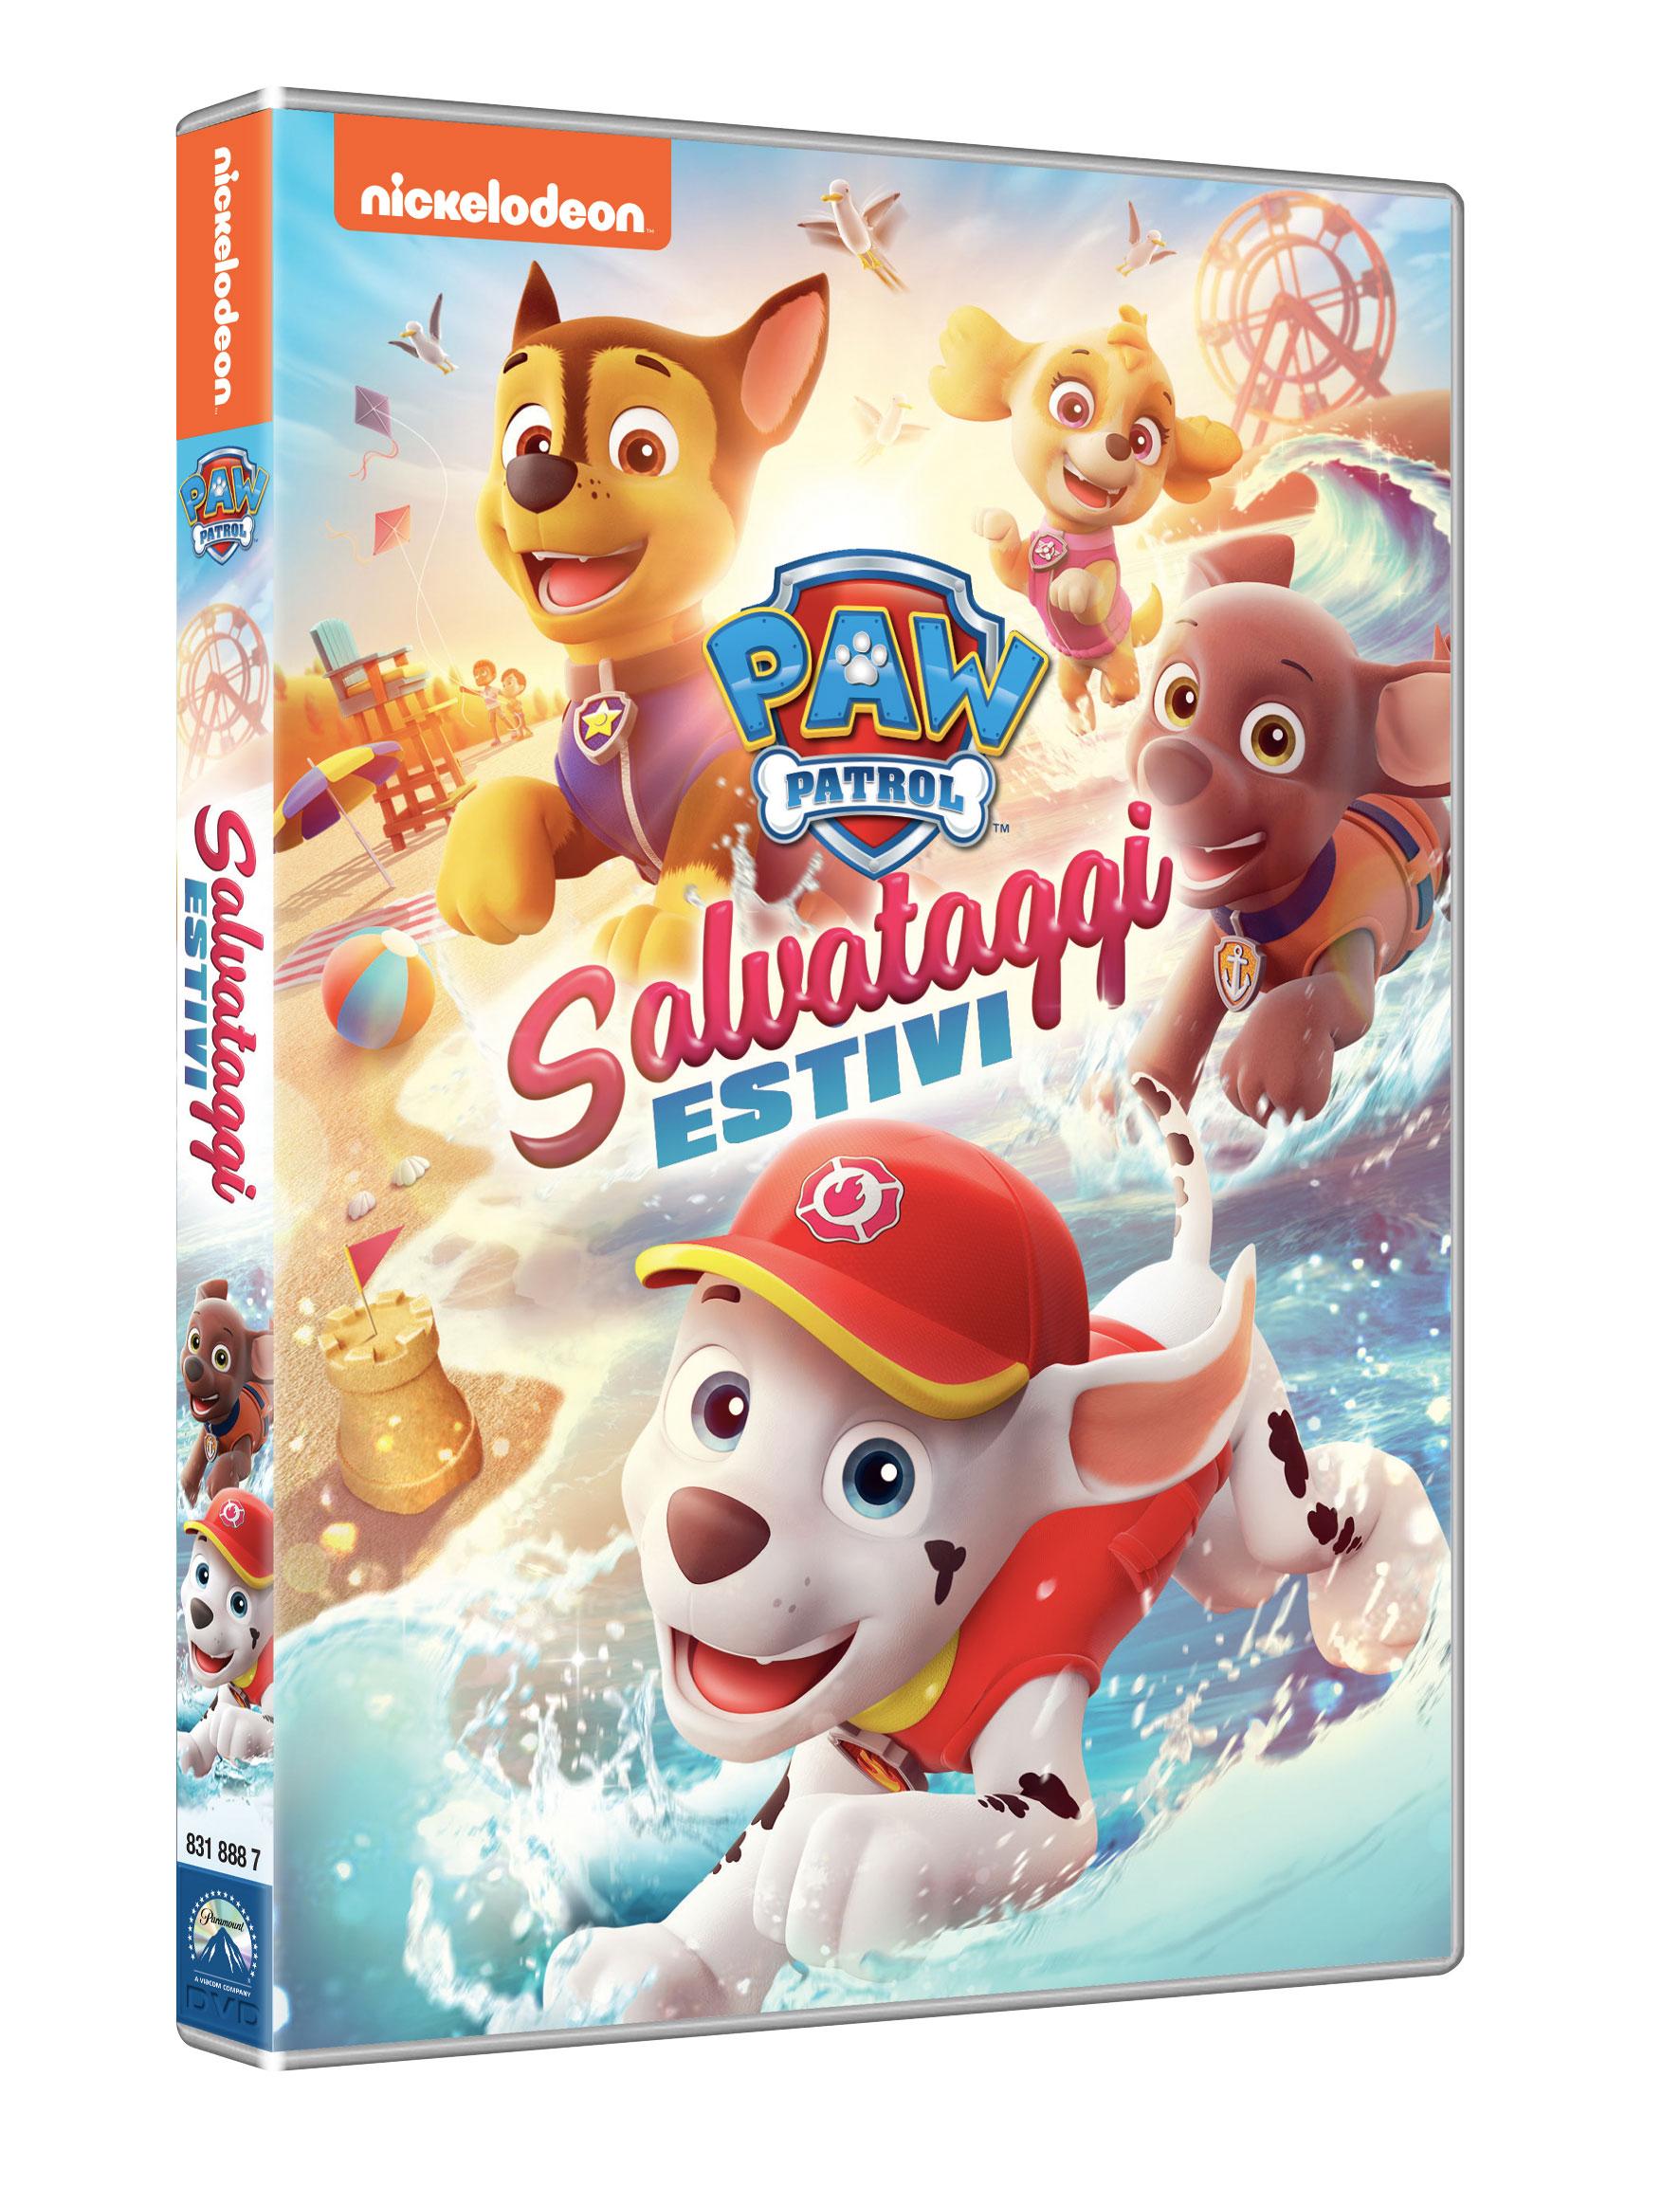 PAW PATROL - SALVATAGGI ESTIVI (DVD)